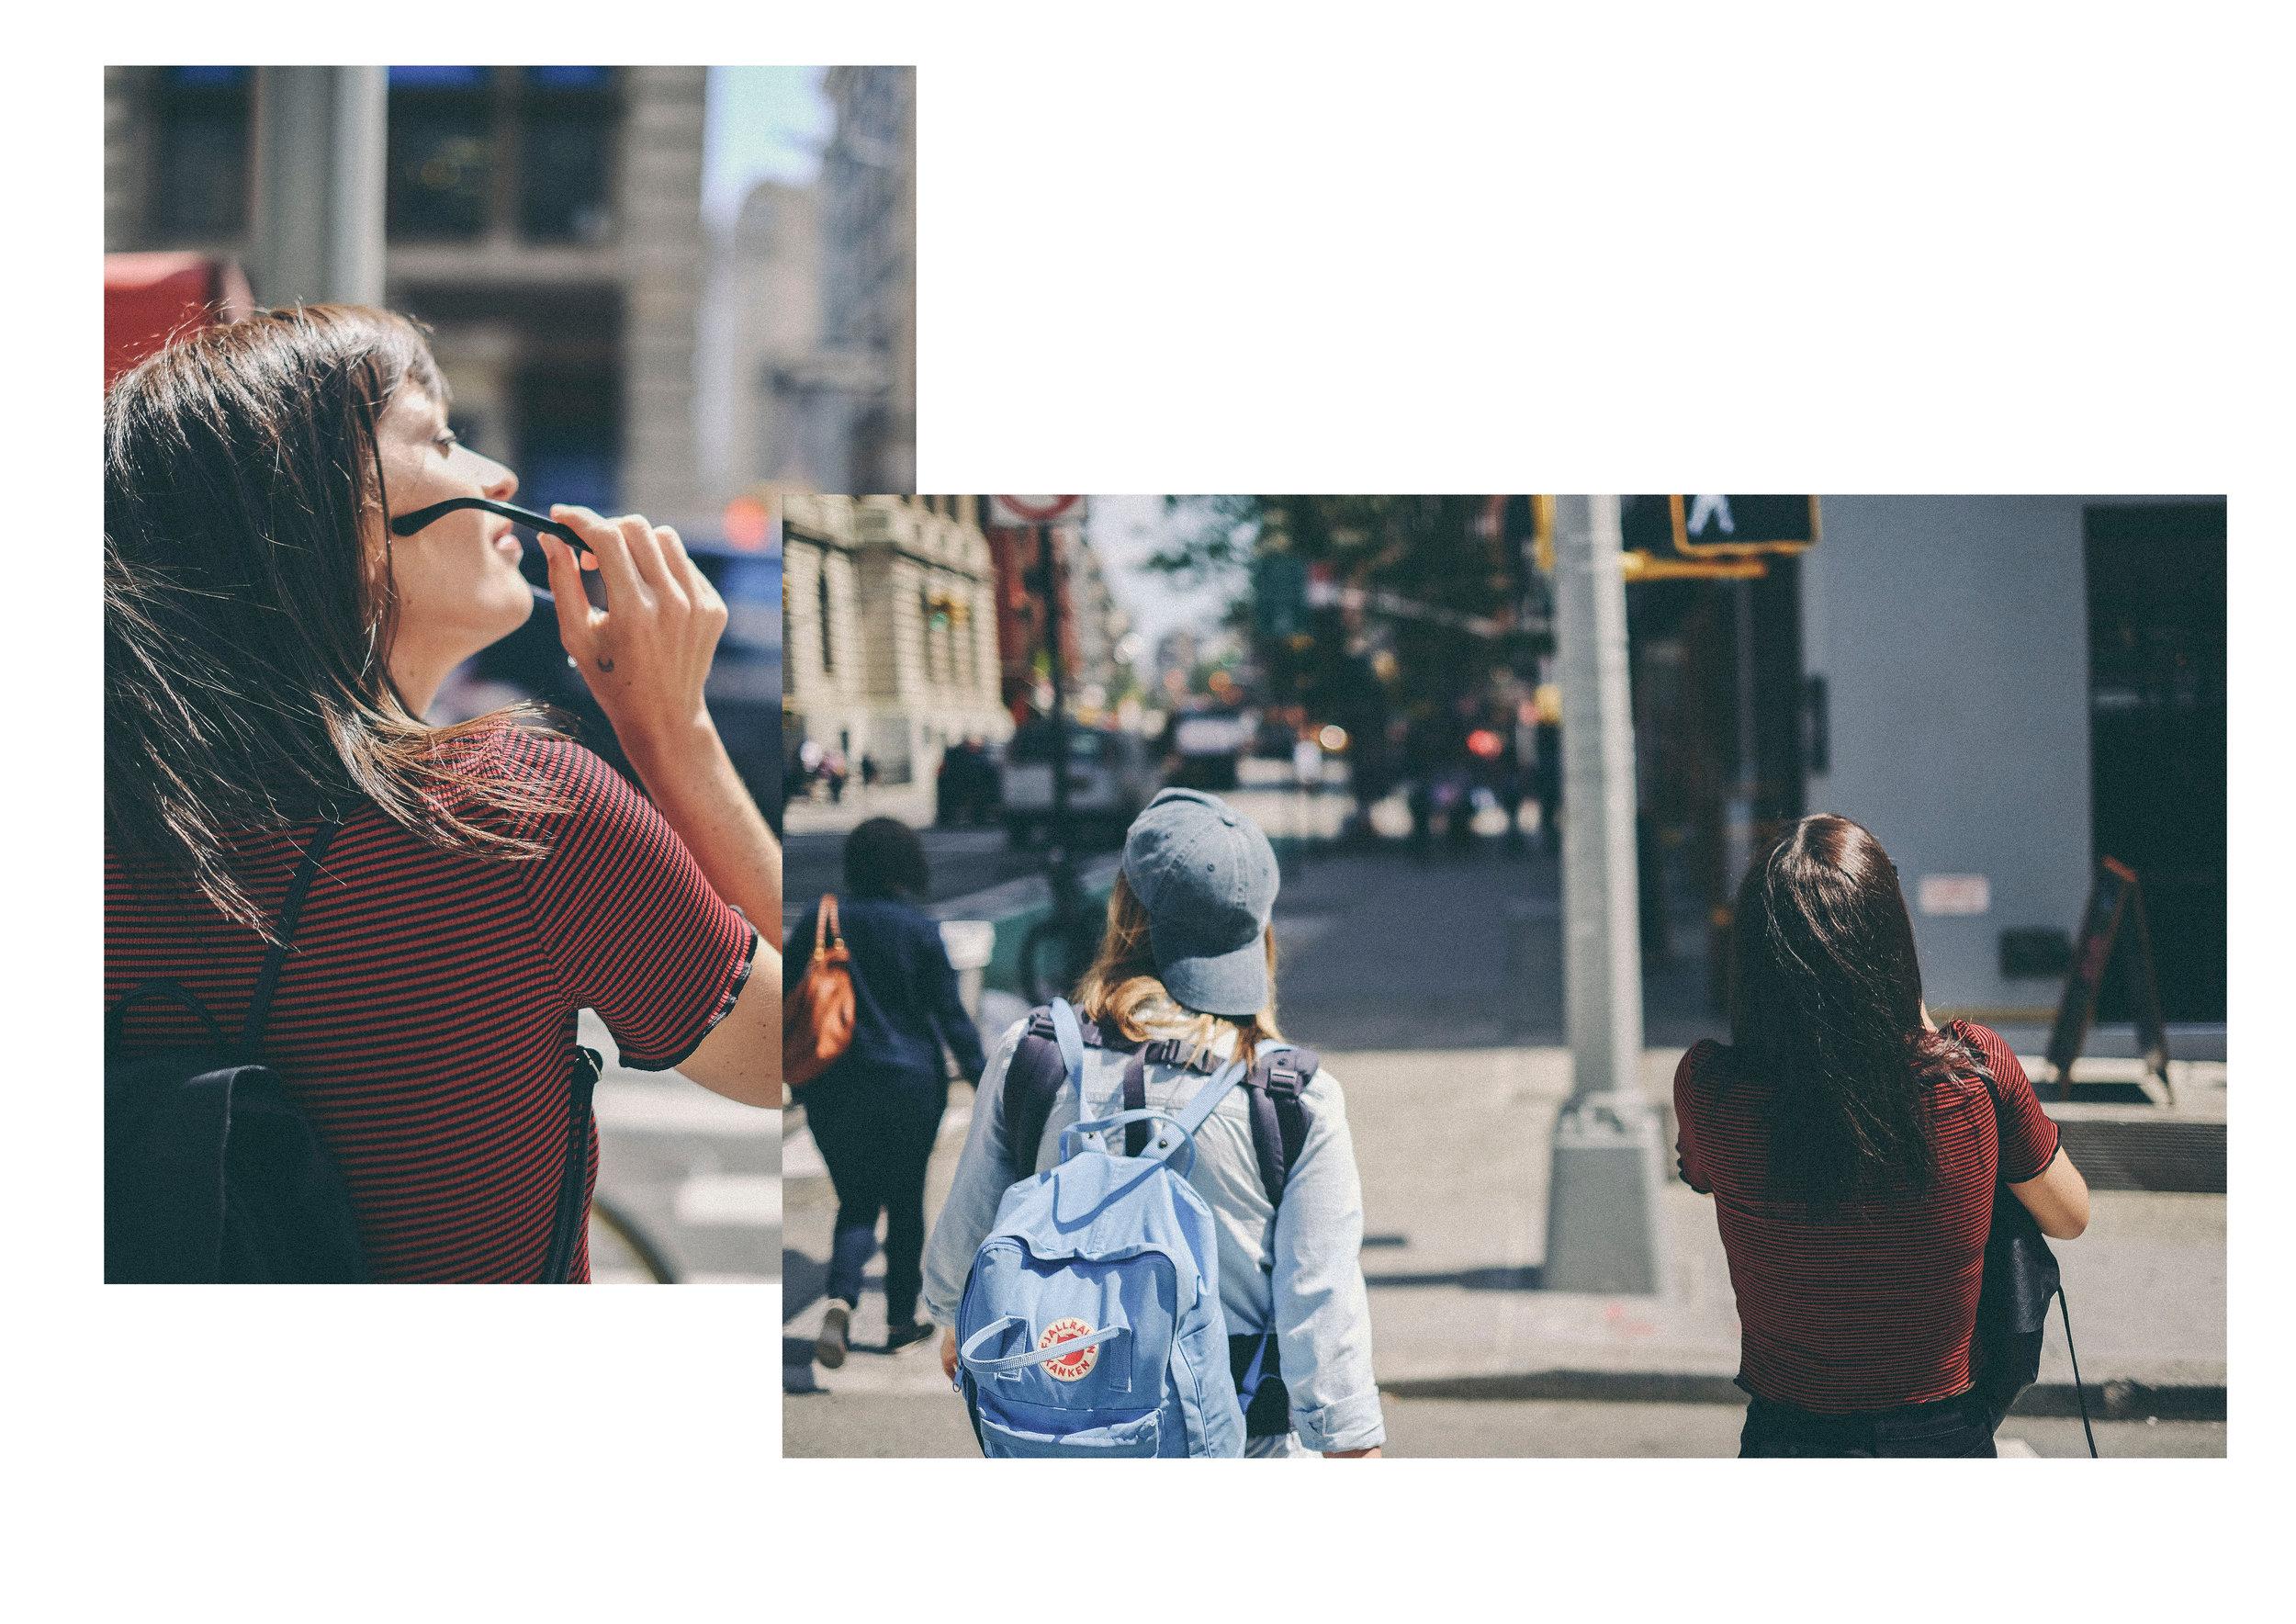 dérrive travel - soho, new york #soho #dumbo #newyork #nyc #brooklyn